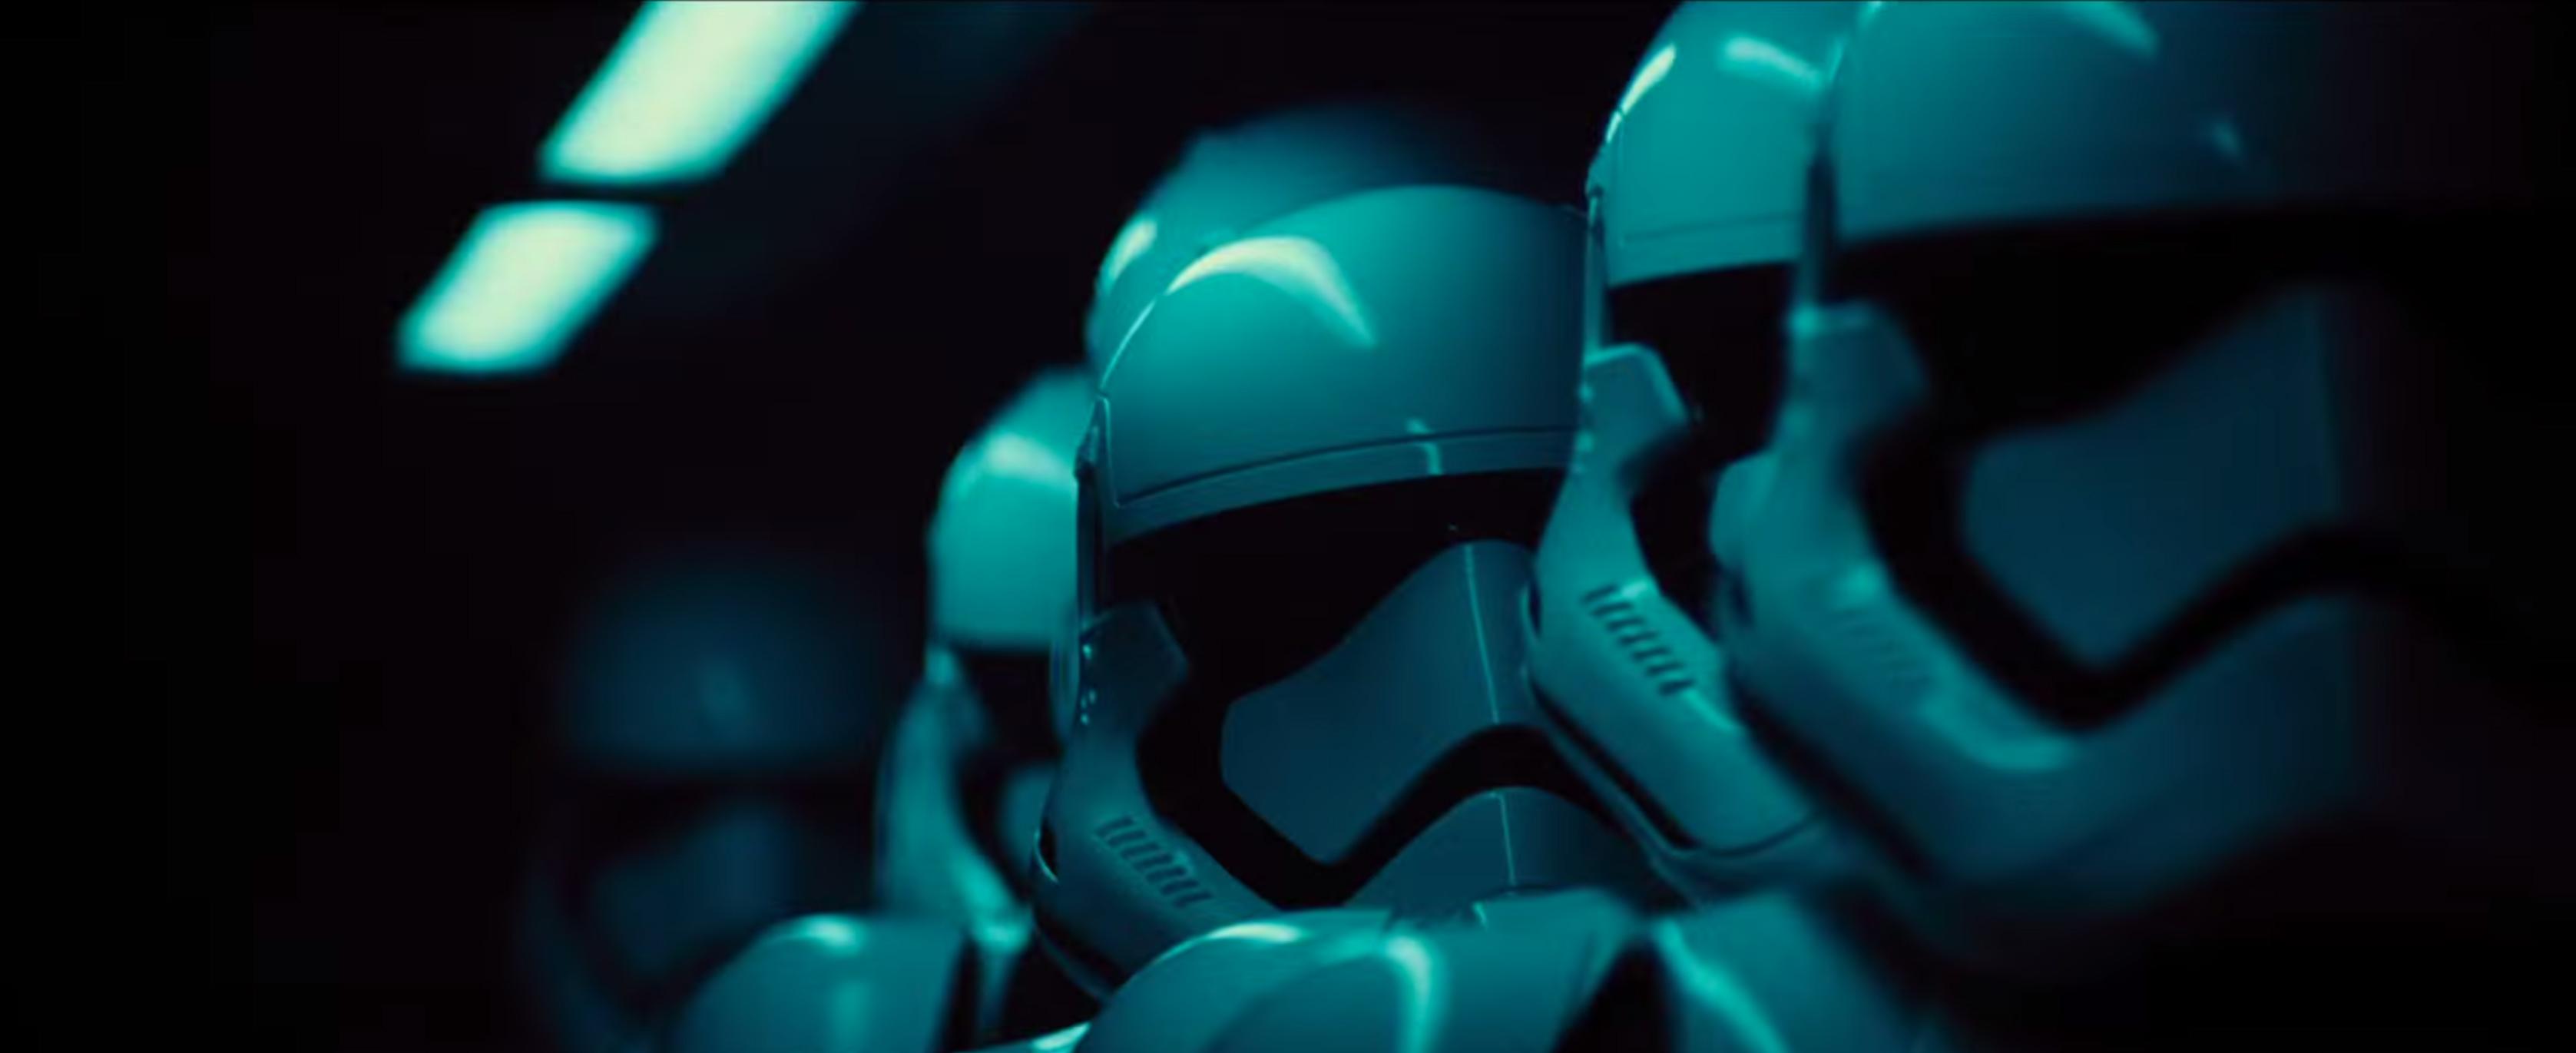 Star-Wars--The-Force-Awakens